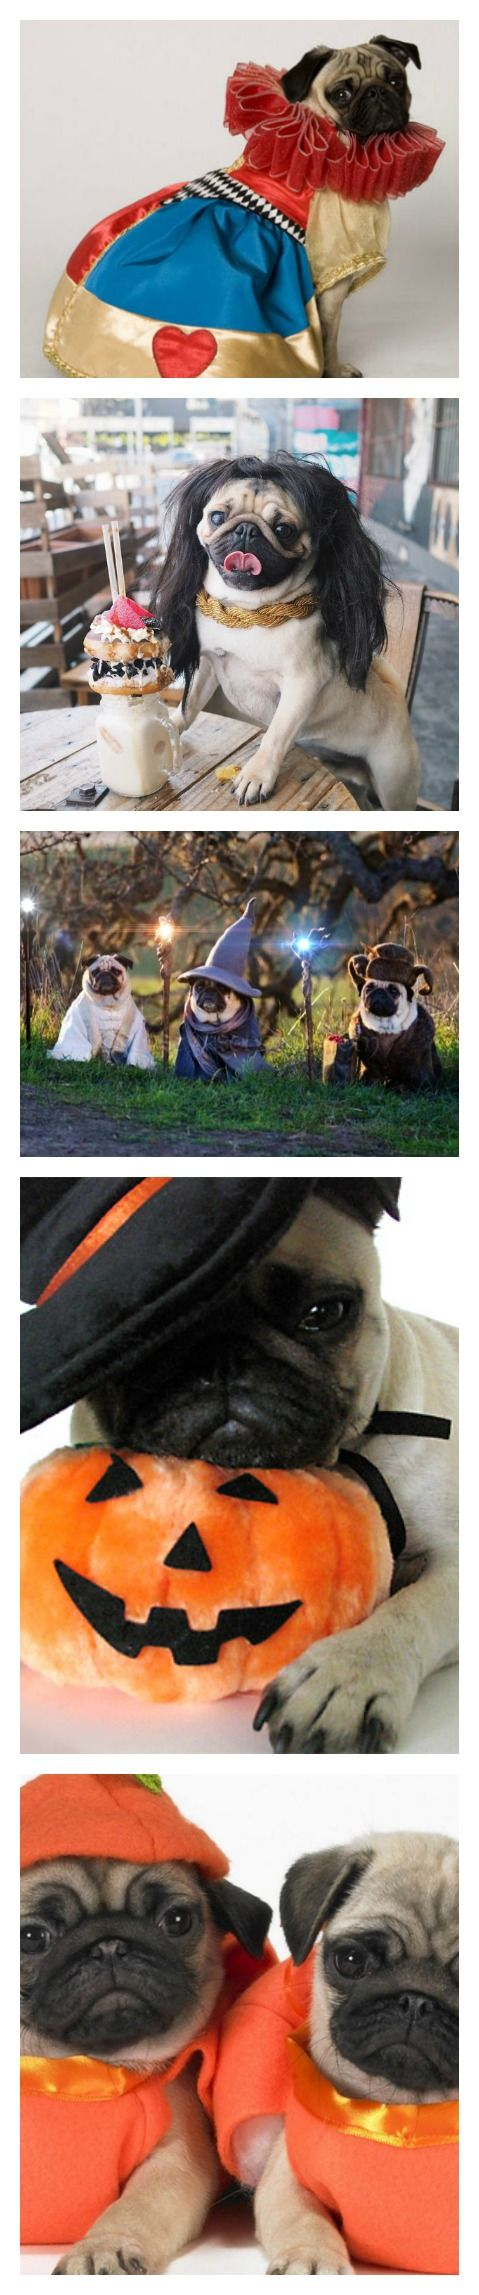 best 25 pug halloween costumes ideas on pinterest pug costume pugs and pug - Pugs Halloween